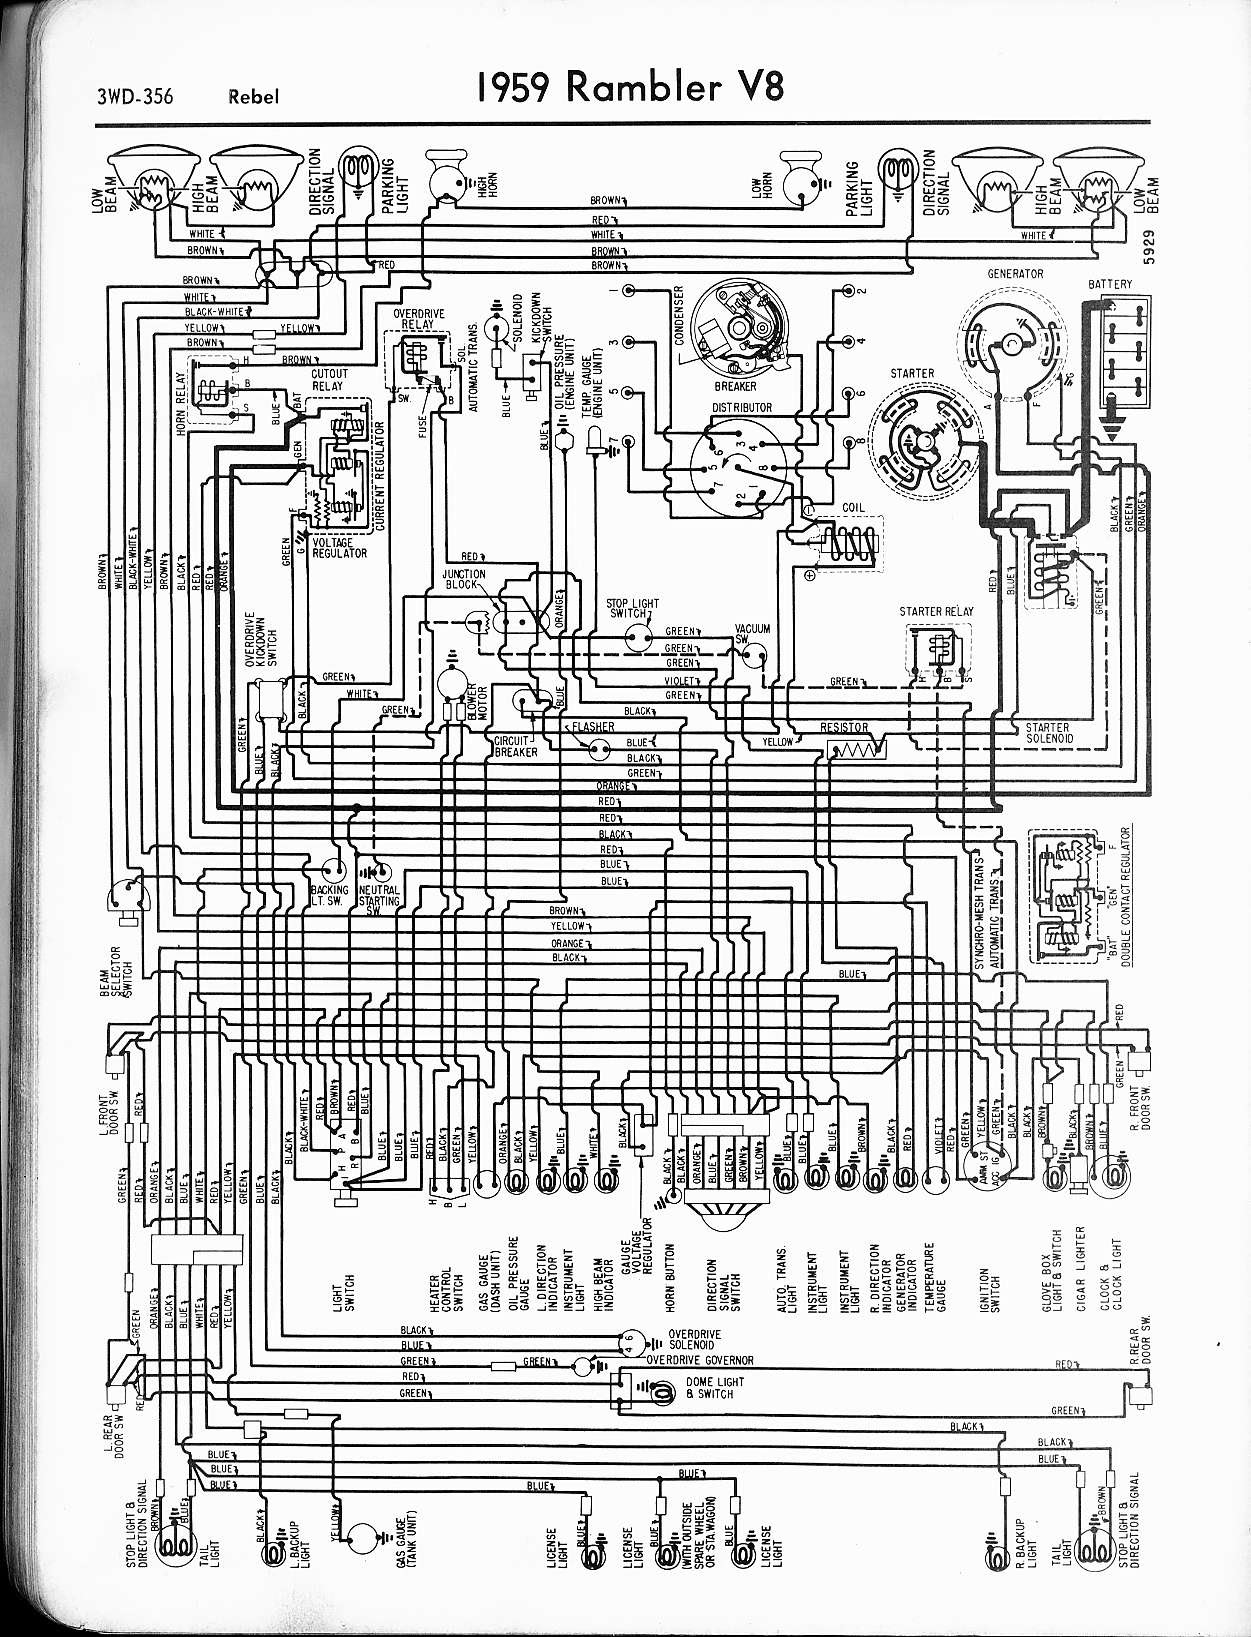 Diagram 1967 Amc Rebel Wiring Diagram Full Version Hd Quality Wiring Diagram Schematictools Biorygen It